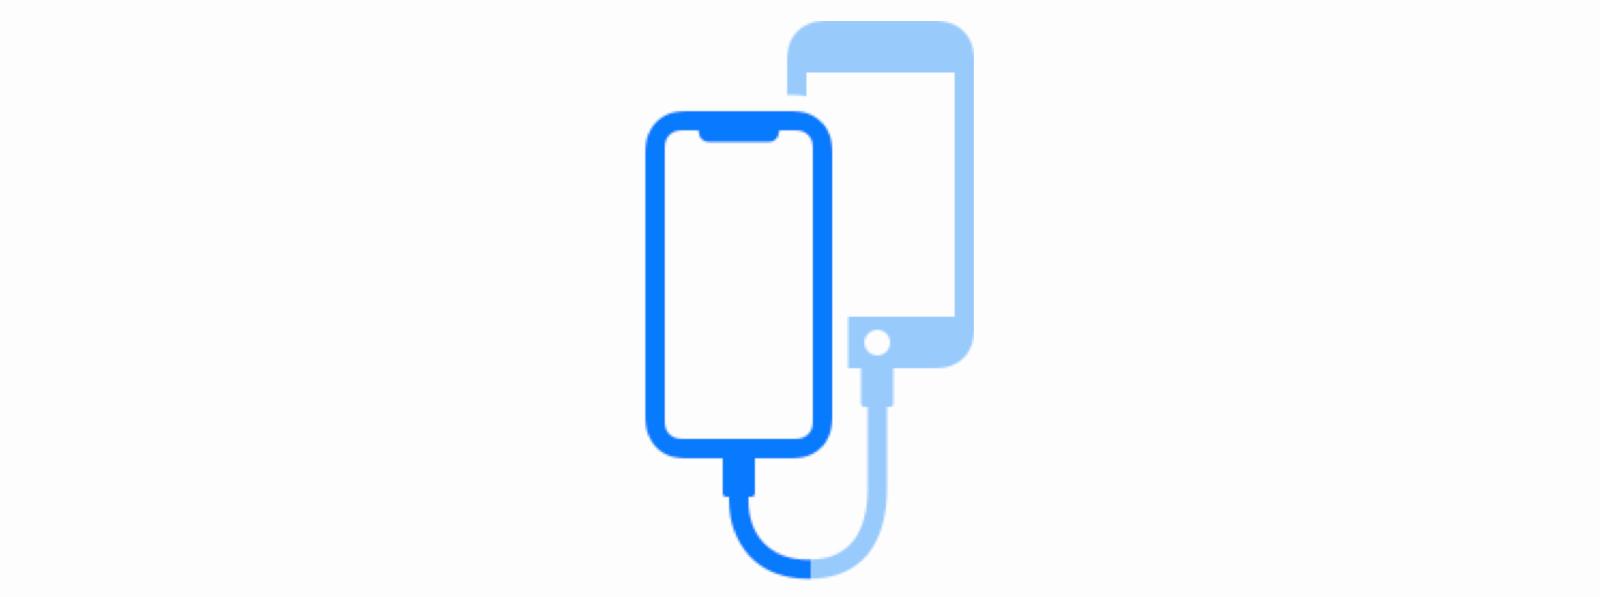 https://www.macfreak.nl/modules/news/images/zArt.WiredTransfer-iOS13b3-1.png